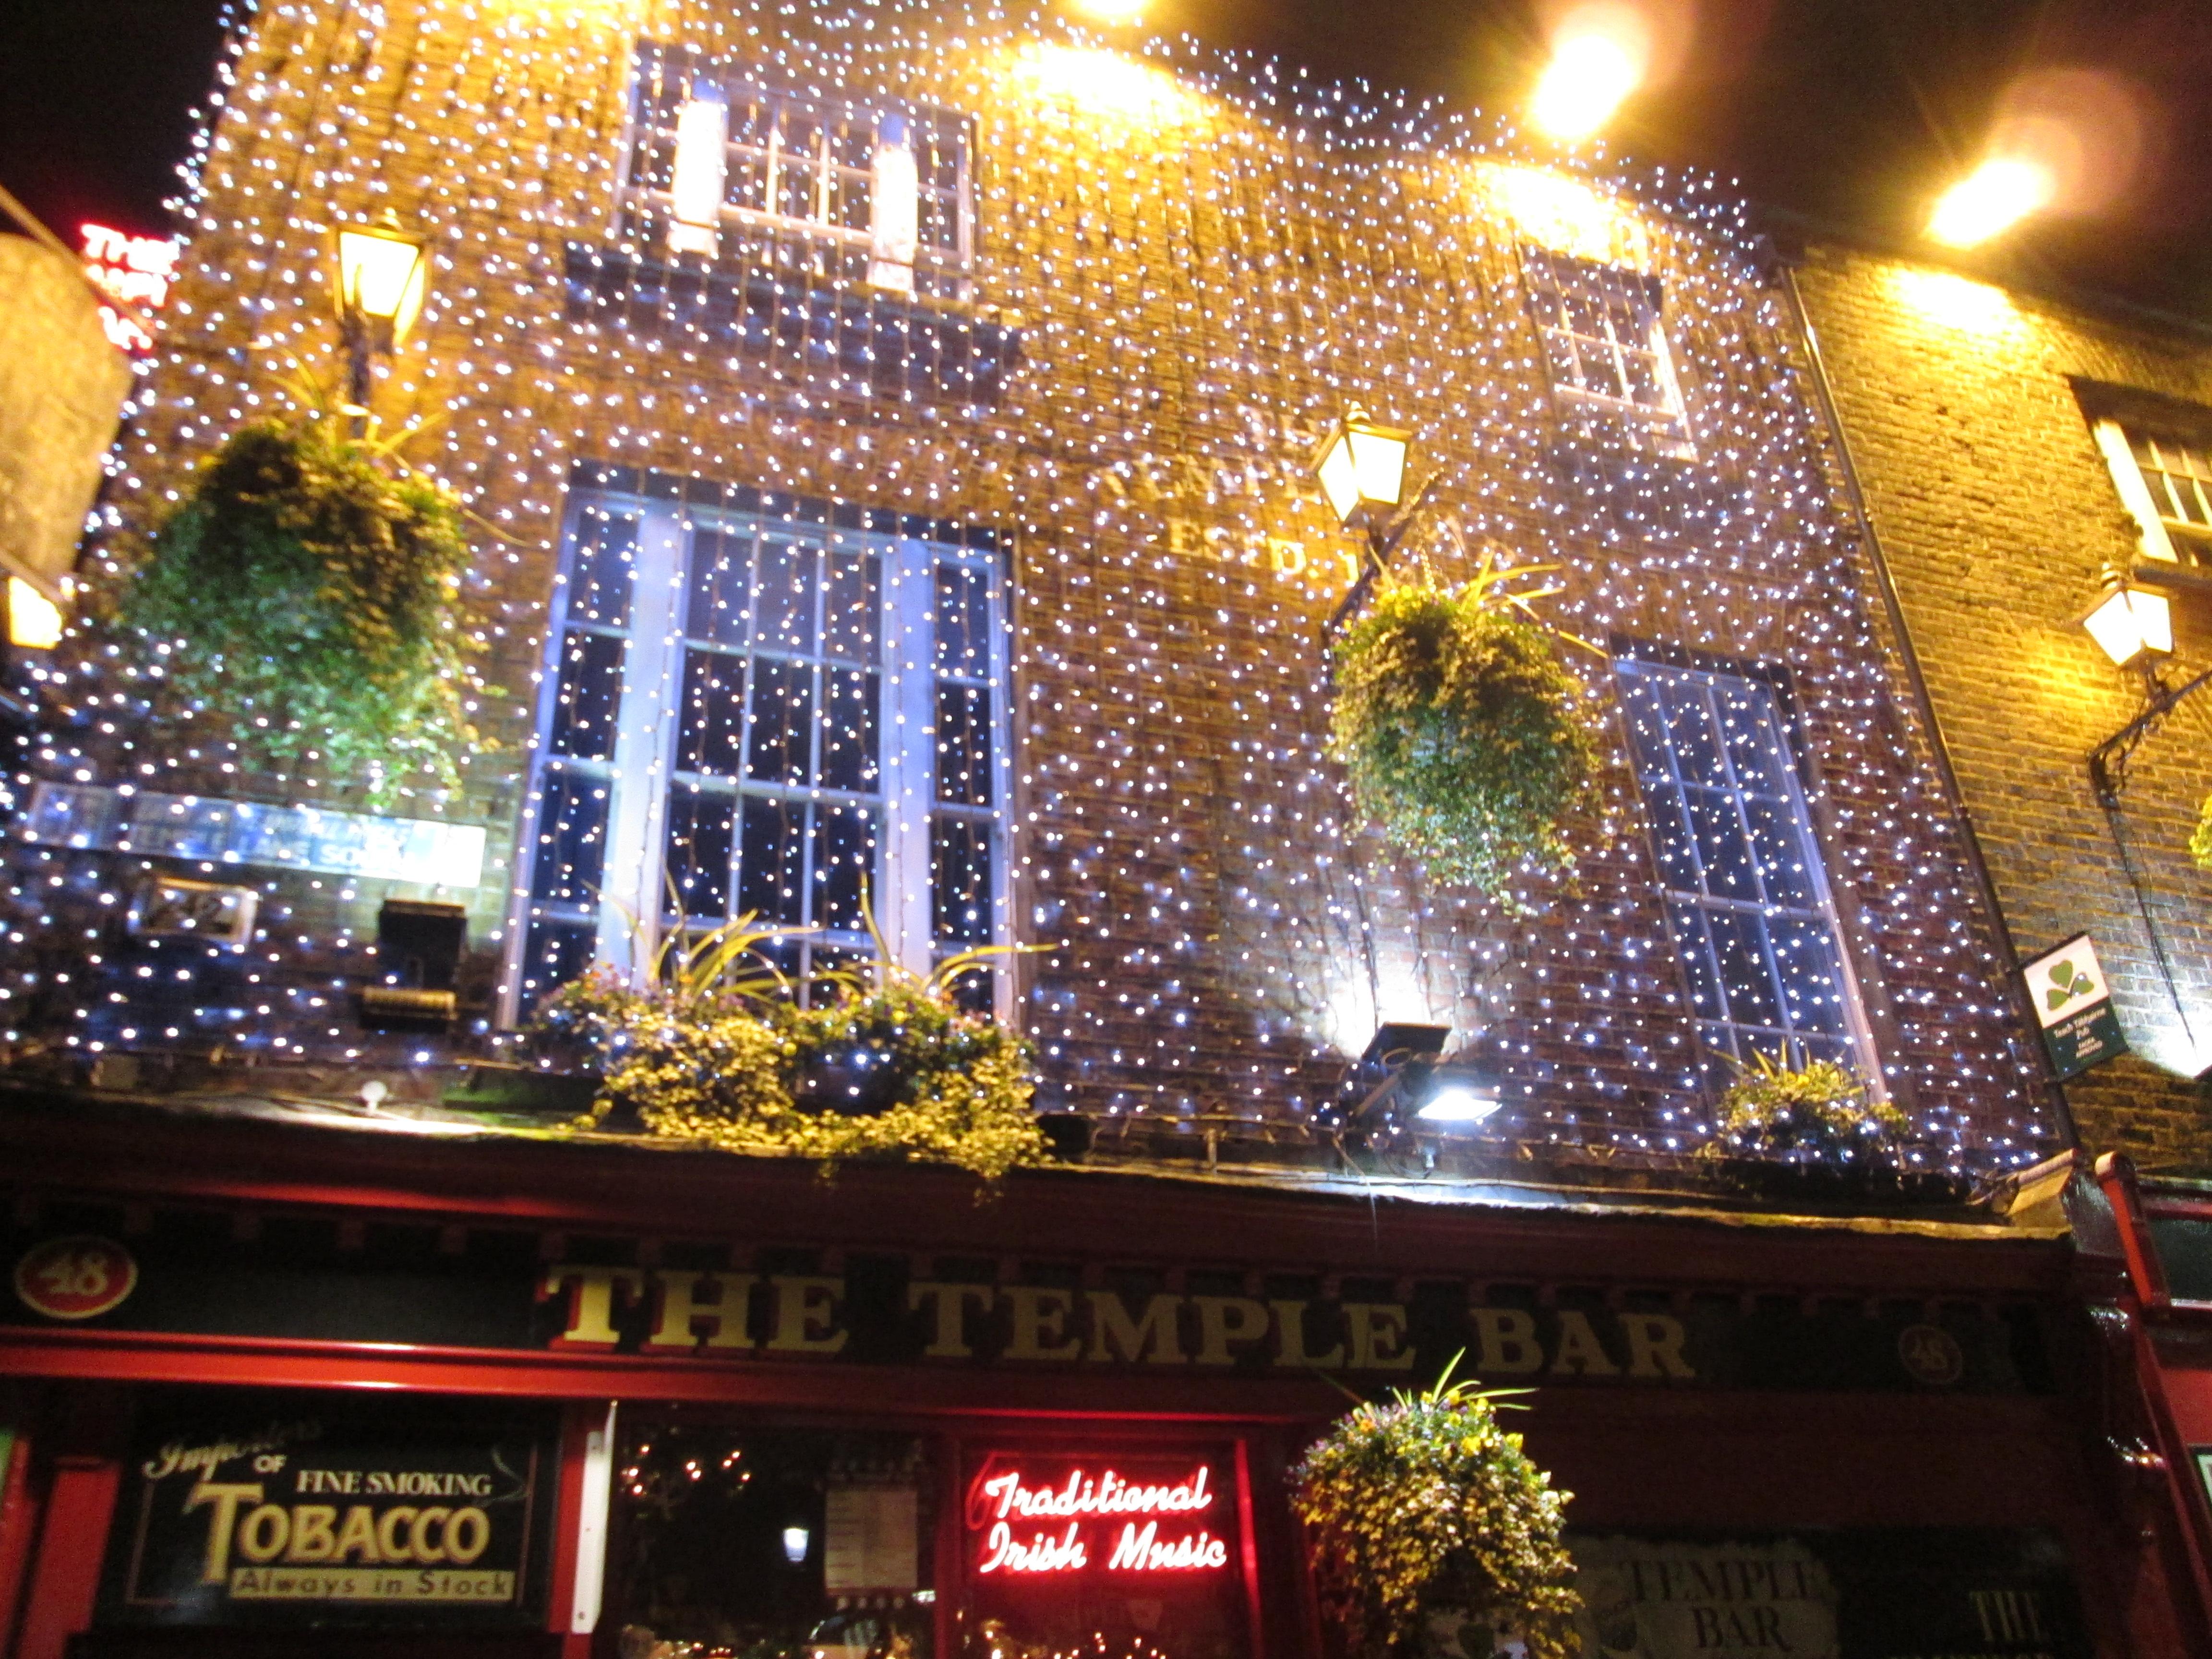 Façade du pub The Temple Bar